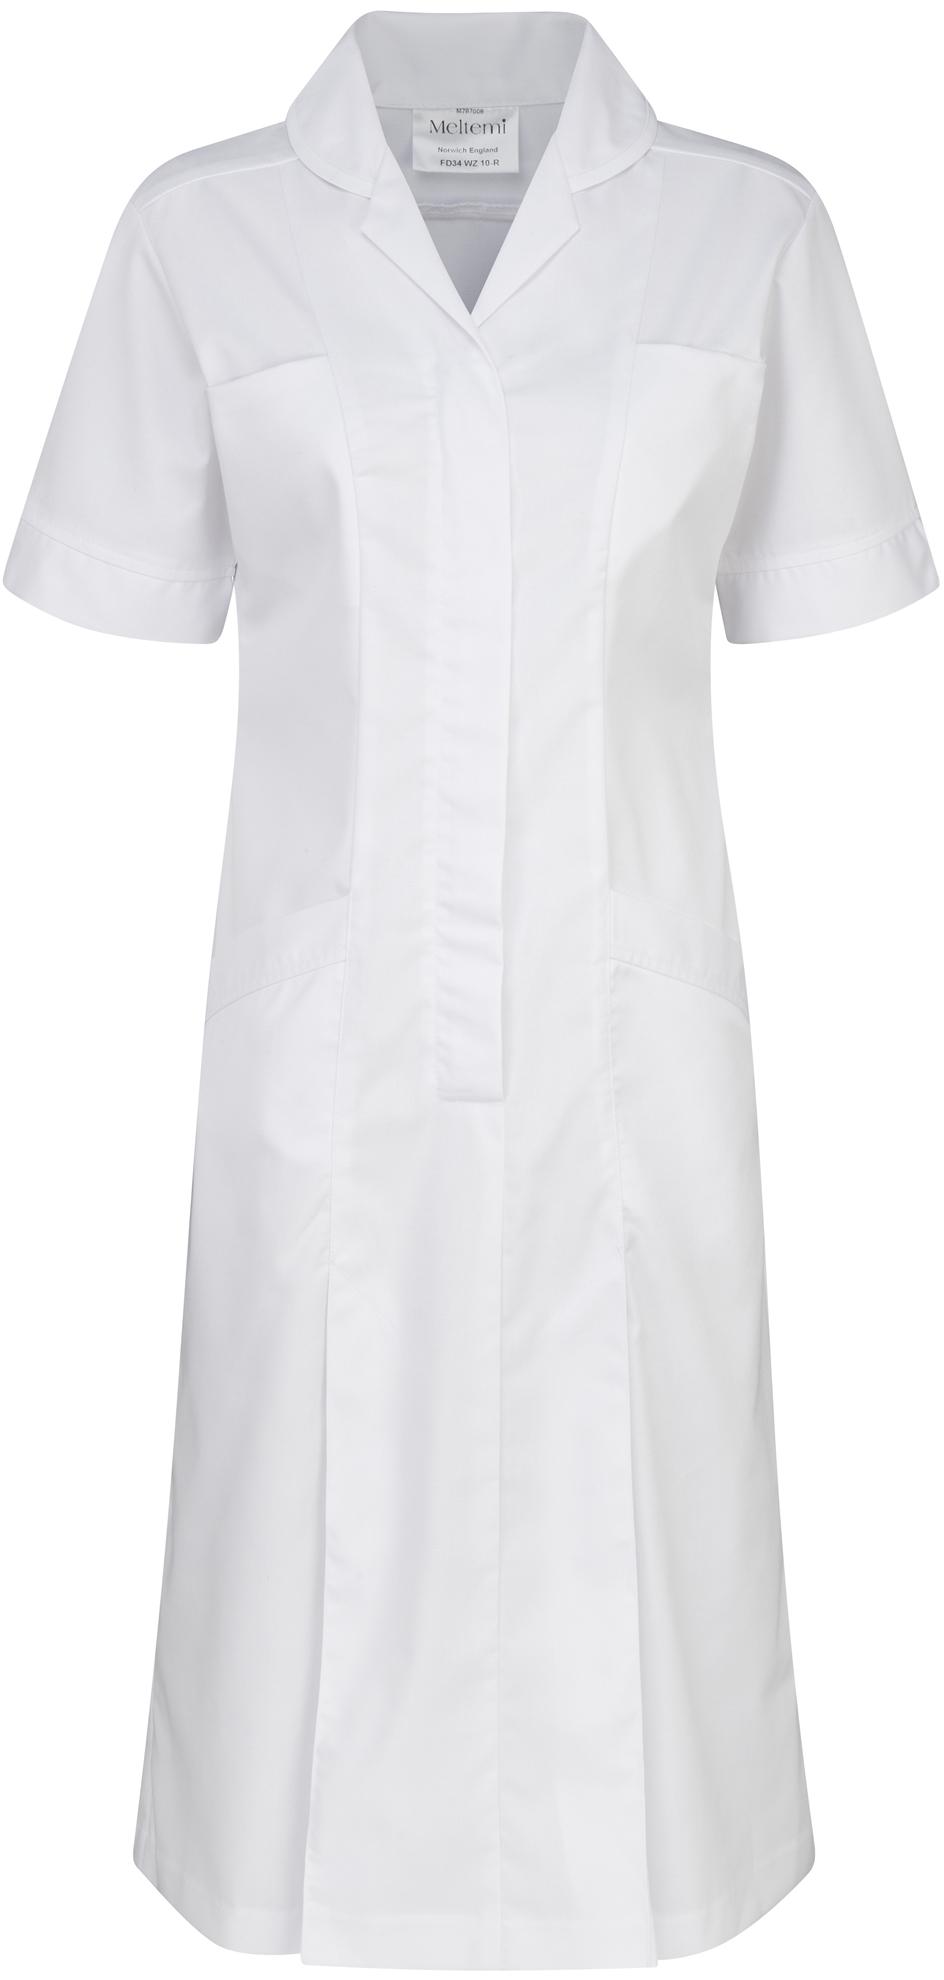 Picture of Plain Colour Dress - White